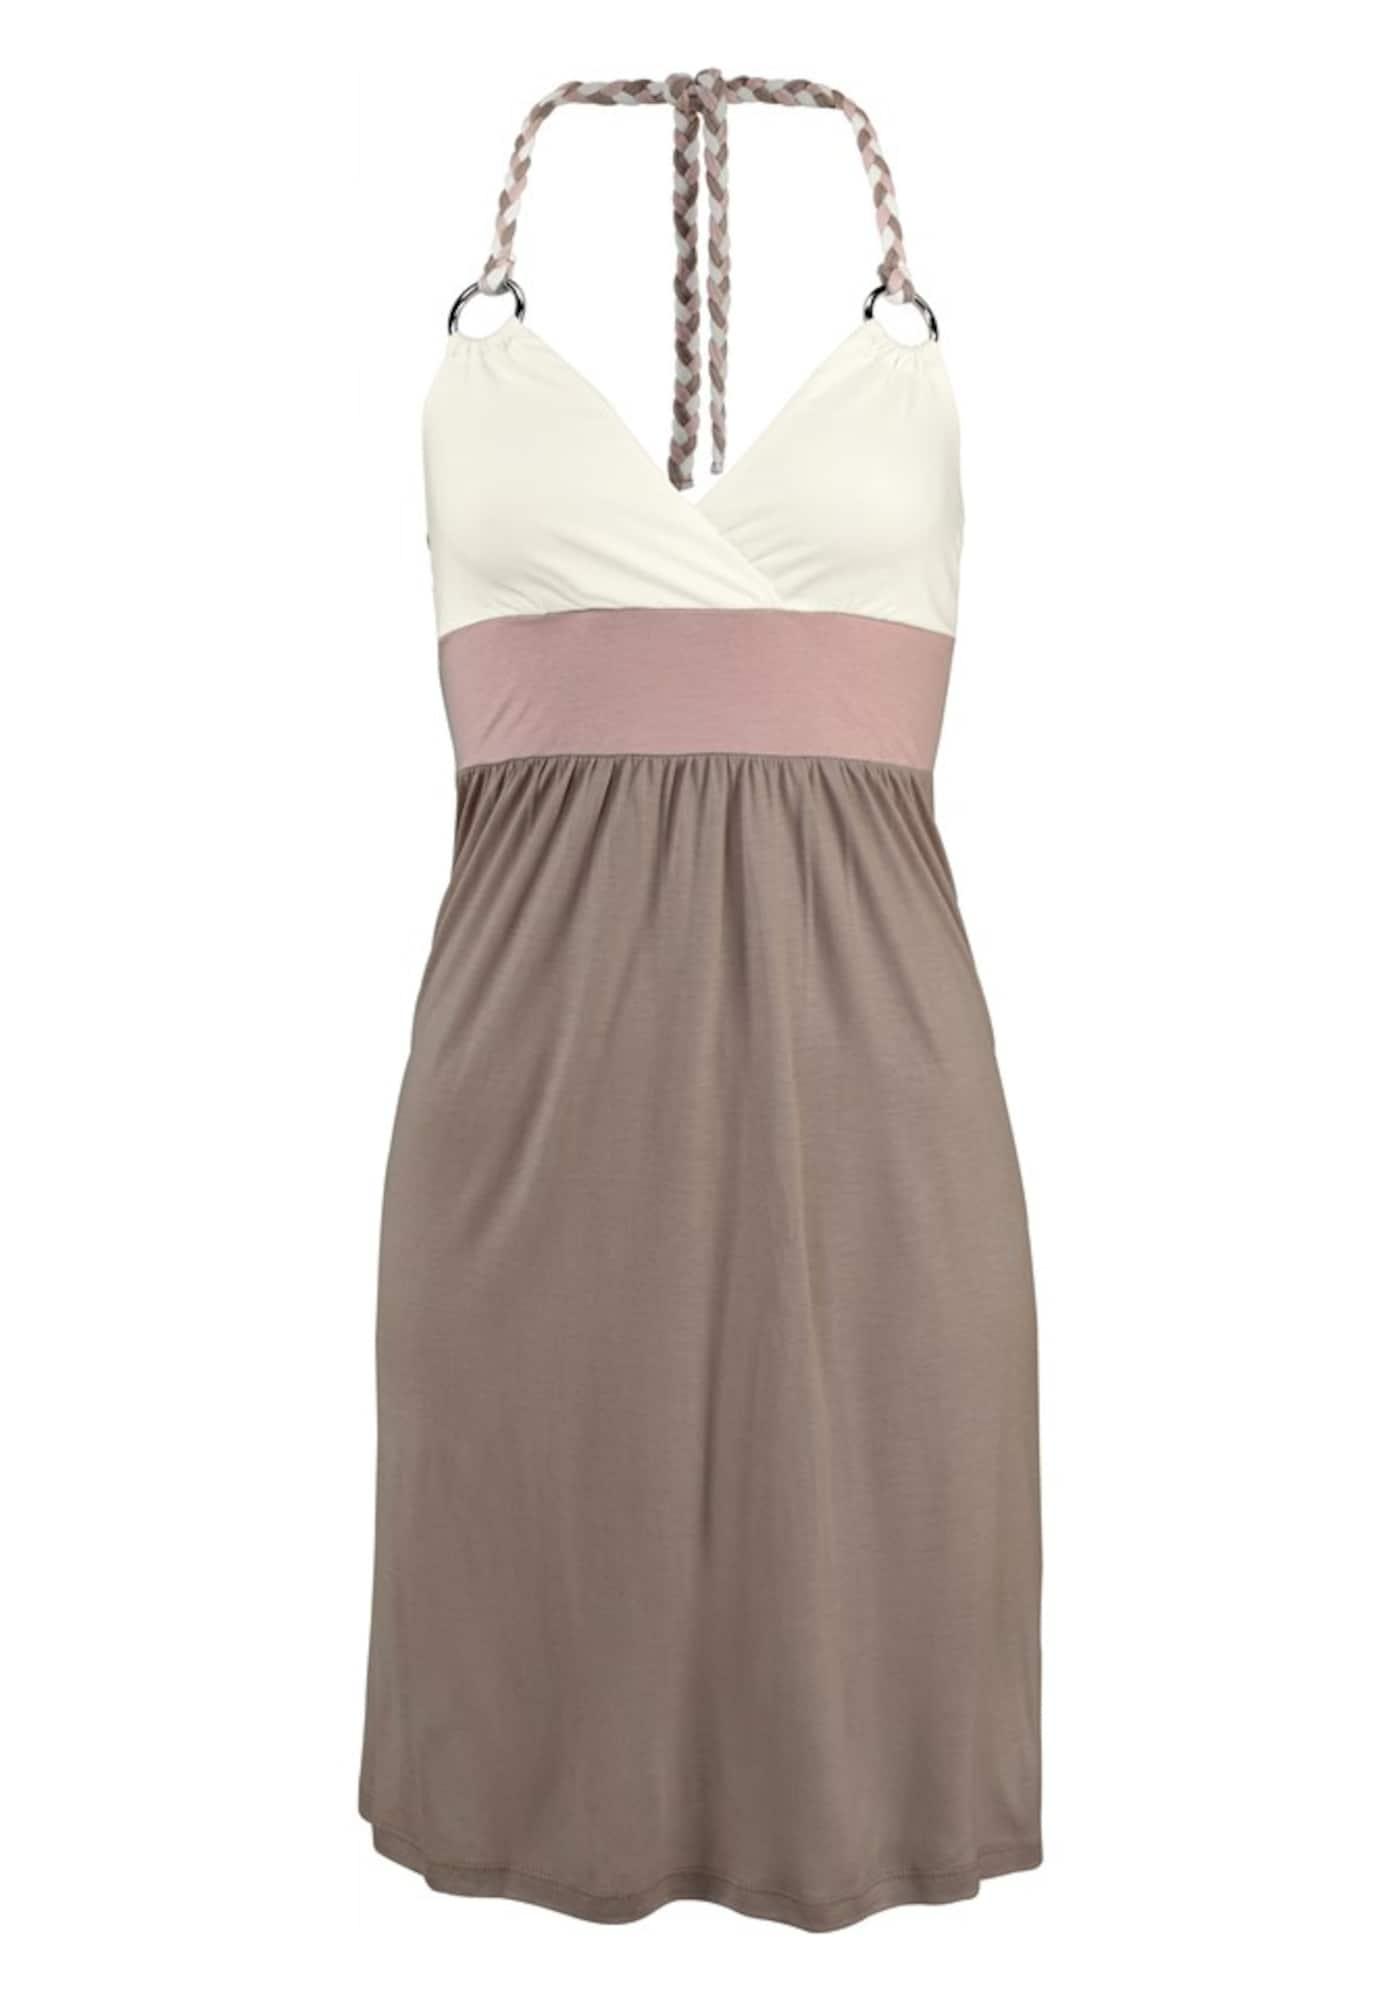 Strandkleid mit Colour-Blocking | Bekleidung > Kleider > Strandkleider | Creme - Taupe | BEACH TIME